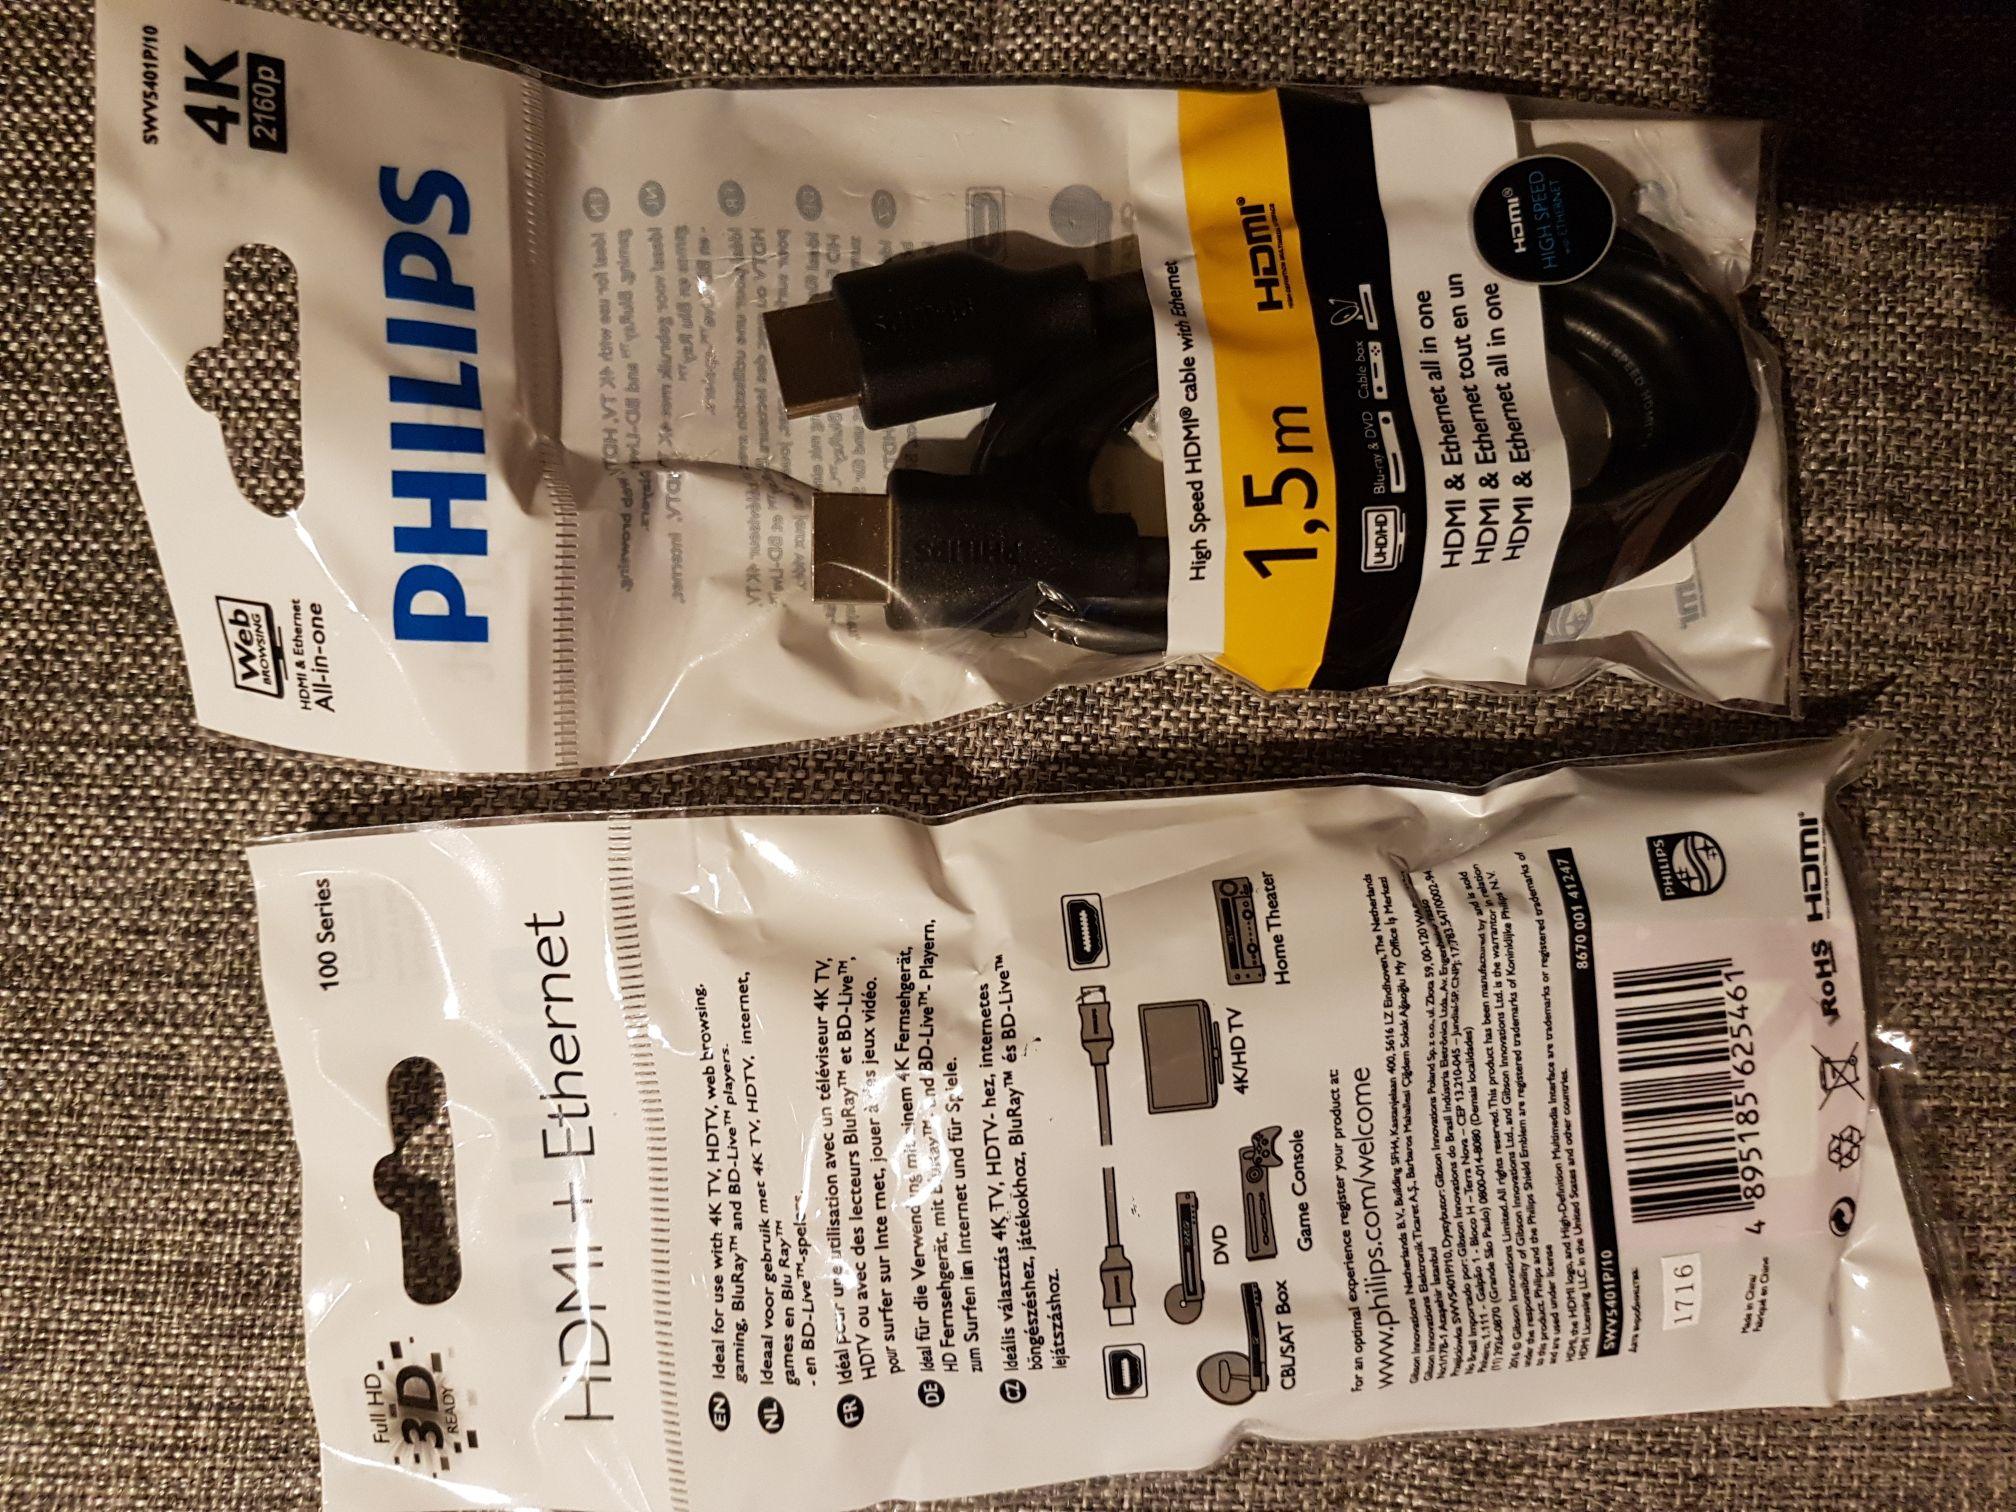 Philips HDMI Kabel 1,5m 2160p 4K-fähig @ Action Bundesweit